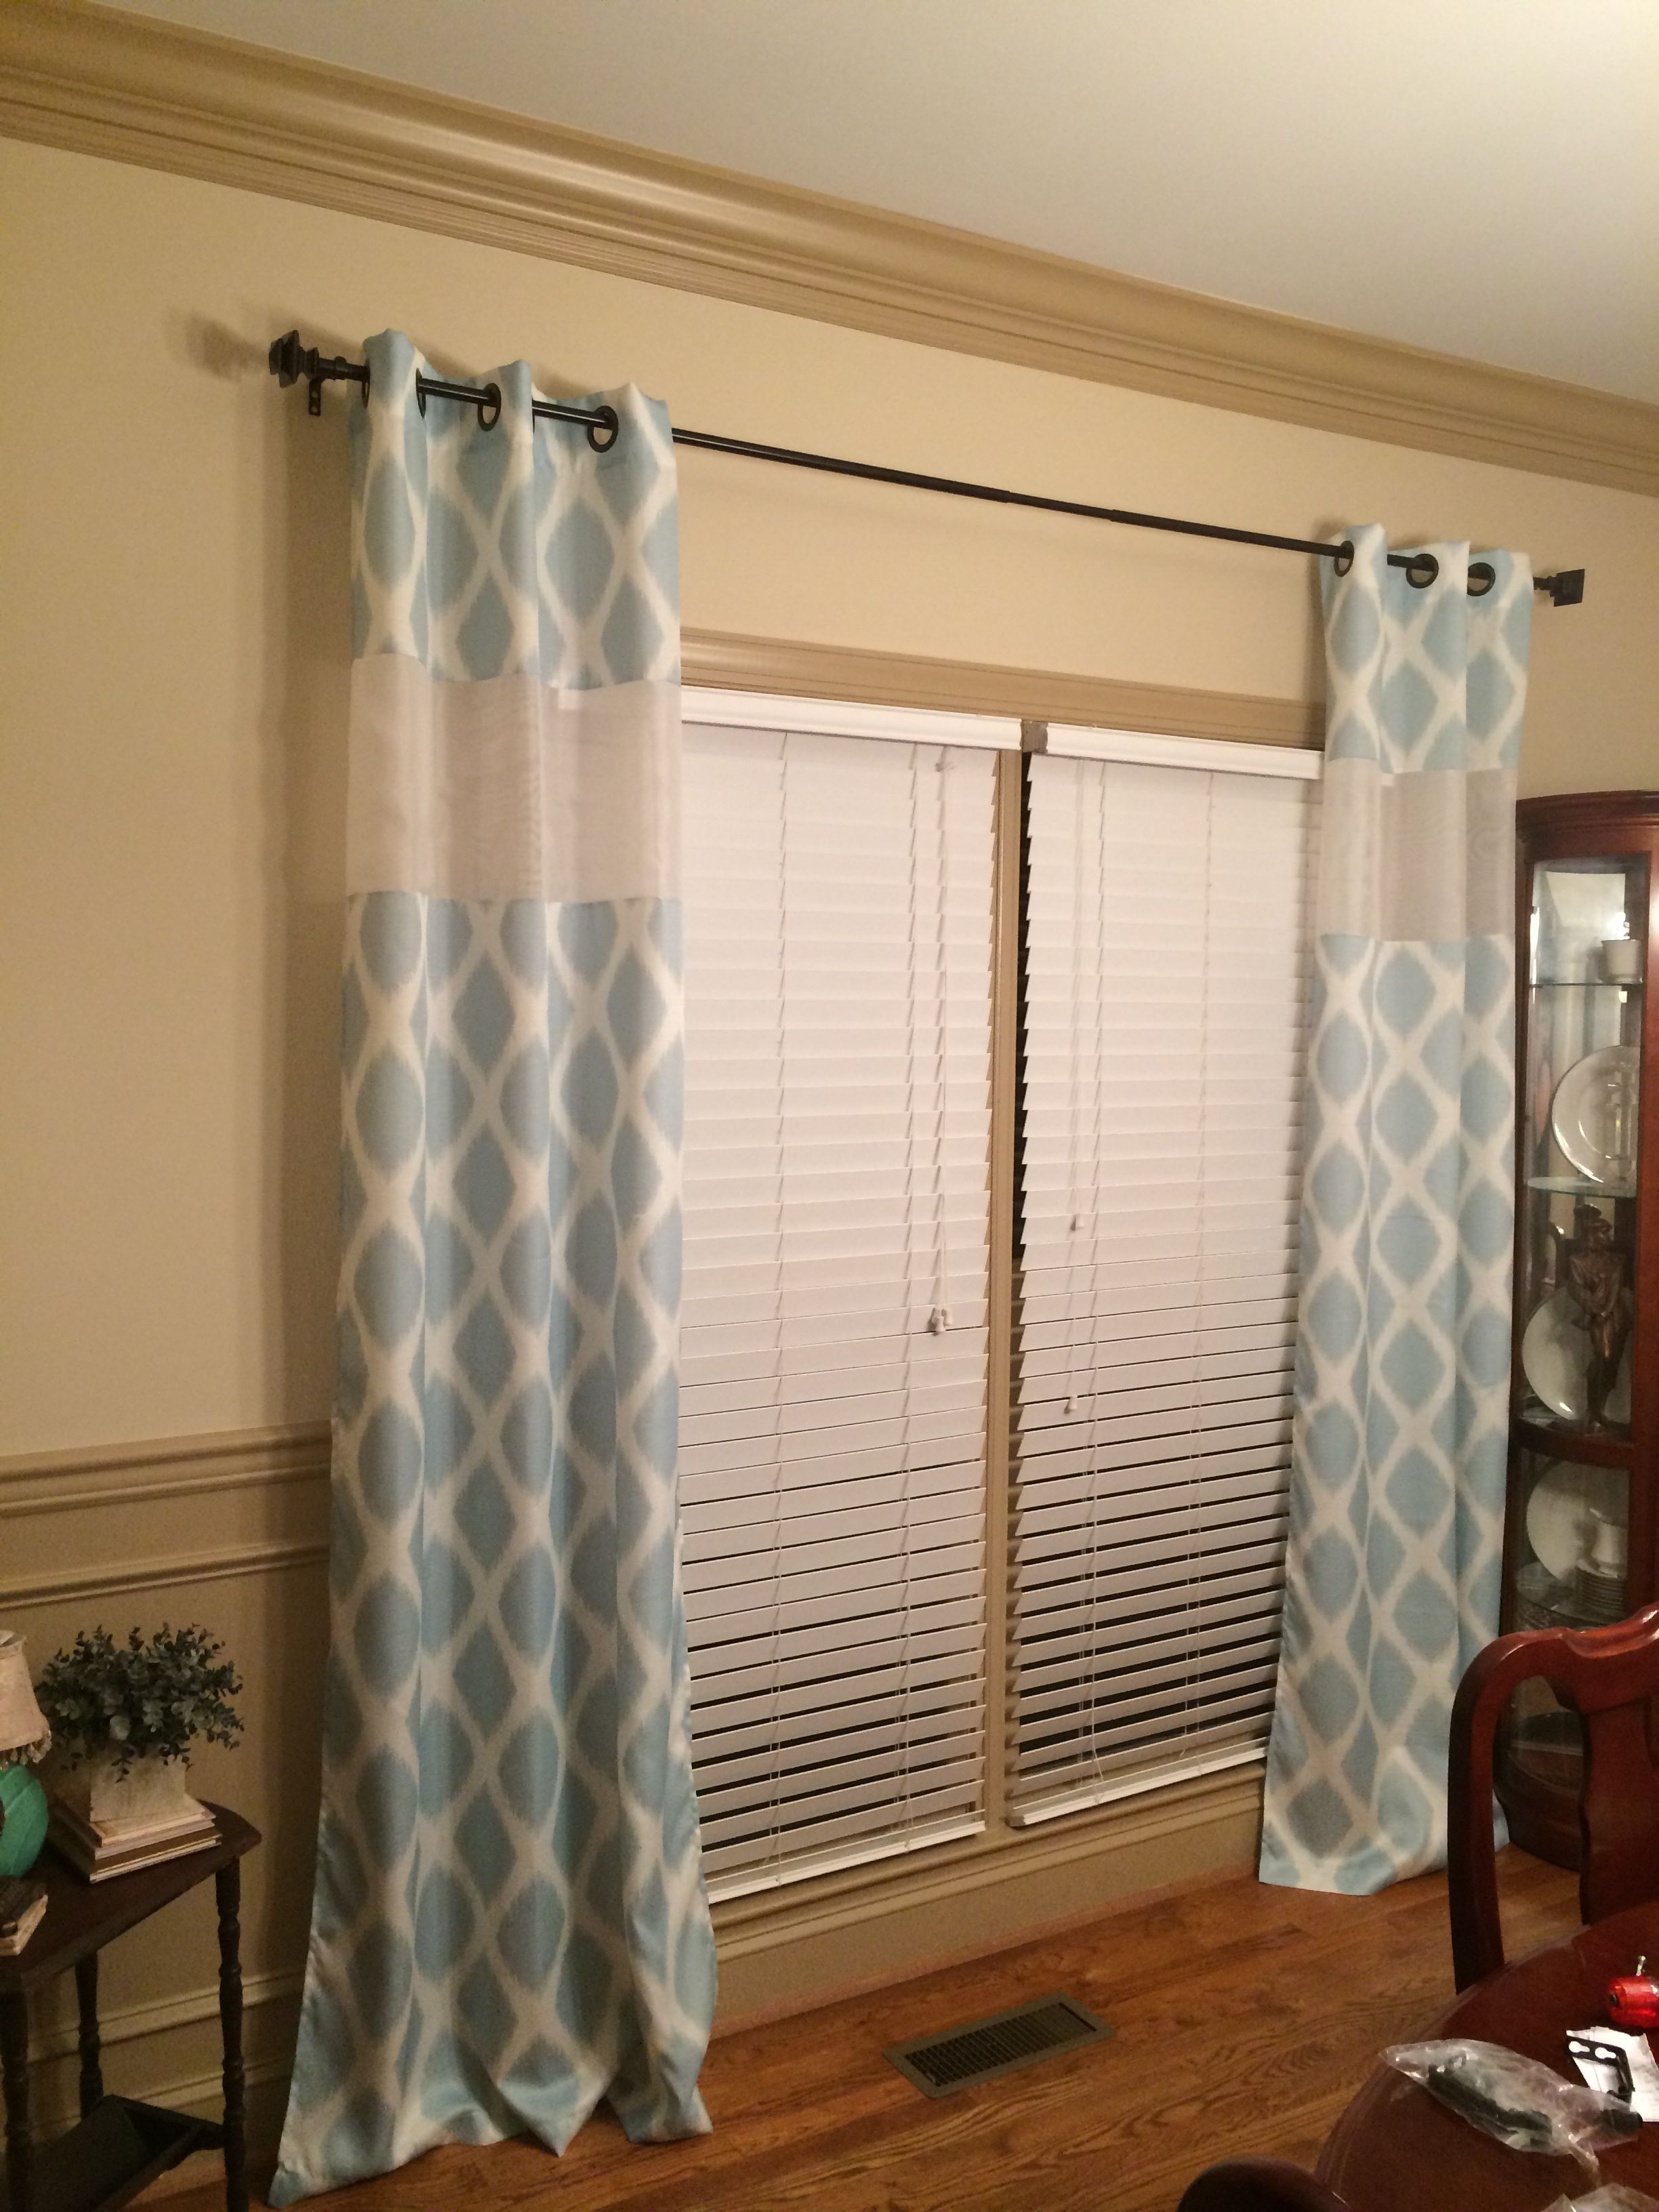 Short Length Bedroom Curtains Drapes Too Short Buy Cheap Sheers At Ross Tjmaxx And Cut Drapes